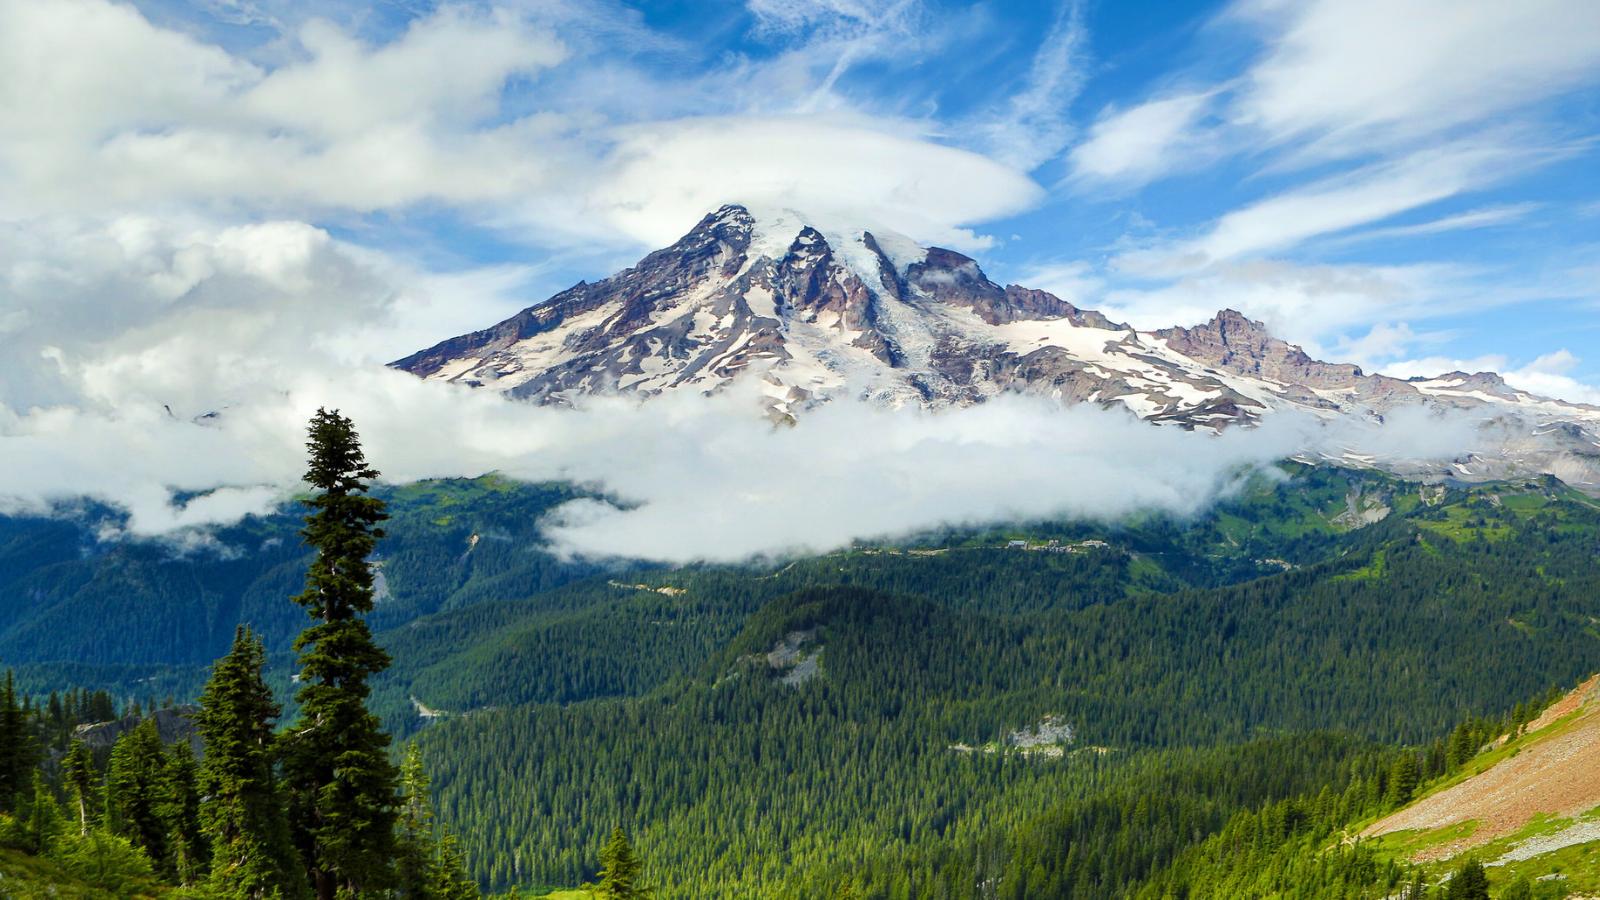 PC: Mick Thompson (Mt. Rainier)